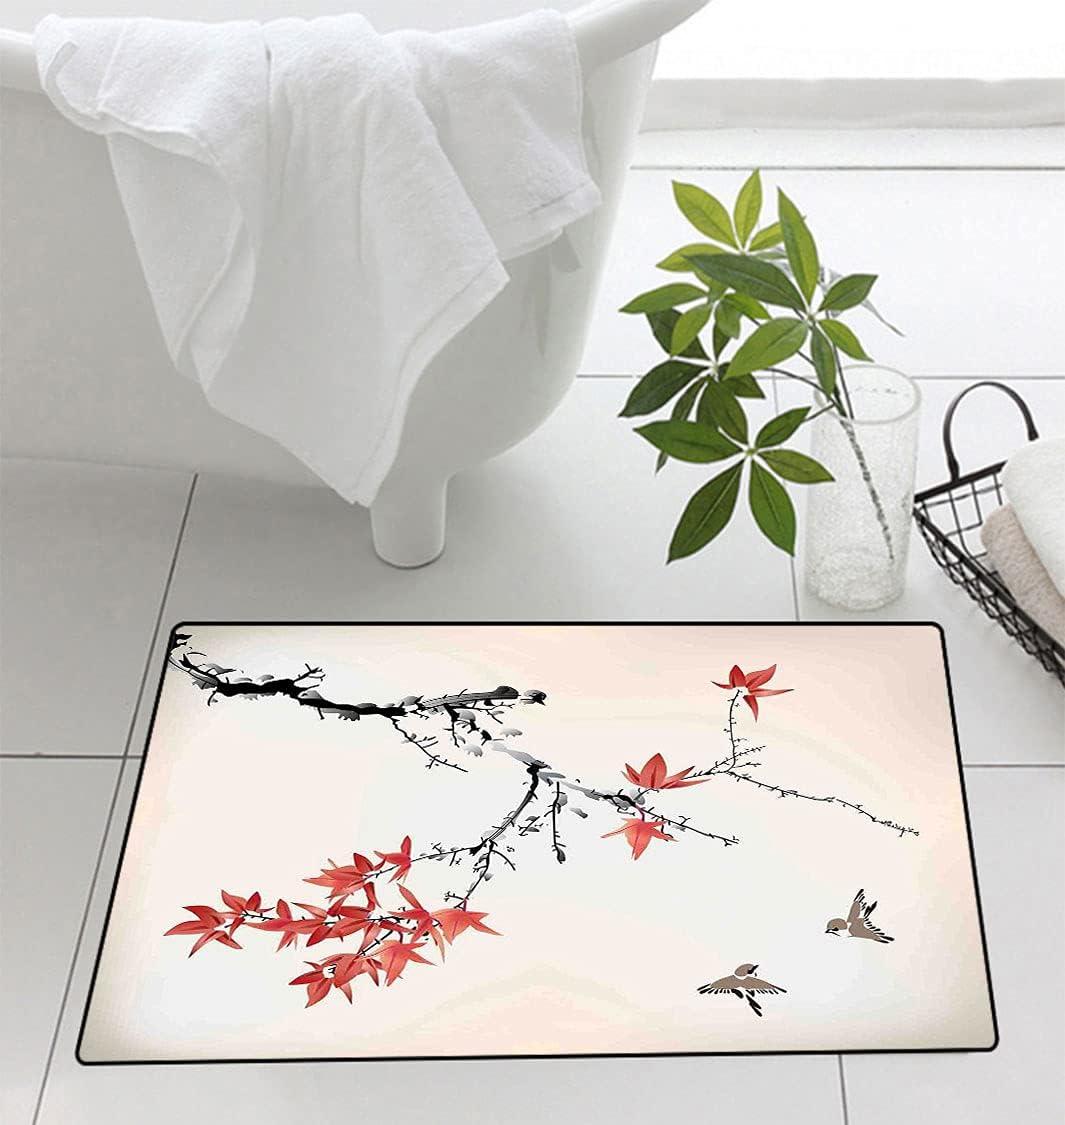 Amazing Max 81% OFF Japanese Doormat Cherry Blossom Rom Sakura Tree Branches Max 61% OFF